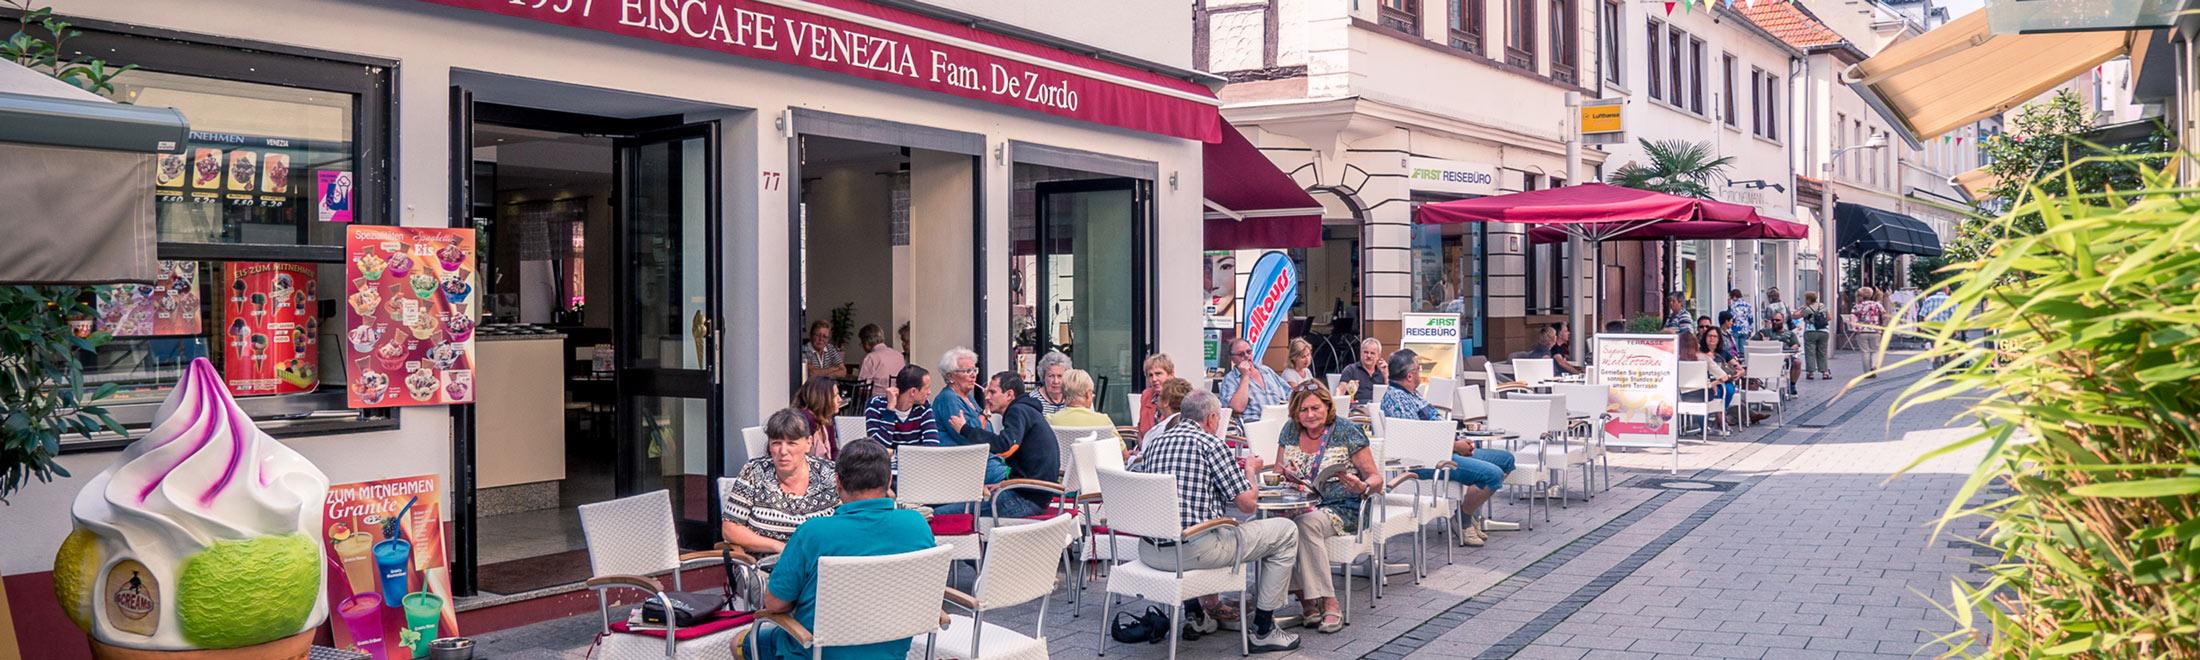 Eiscafe-gruenstadt-de-zordo-2